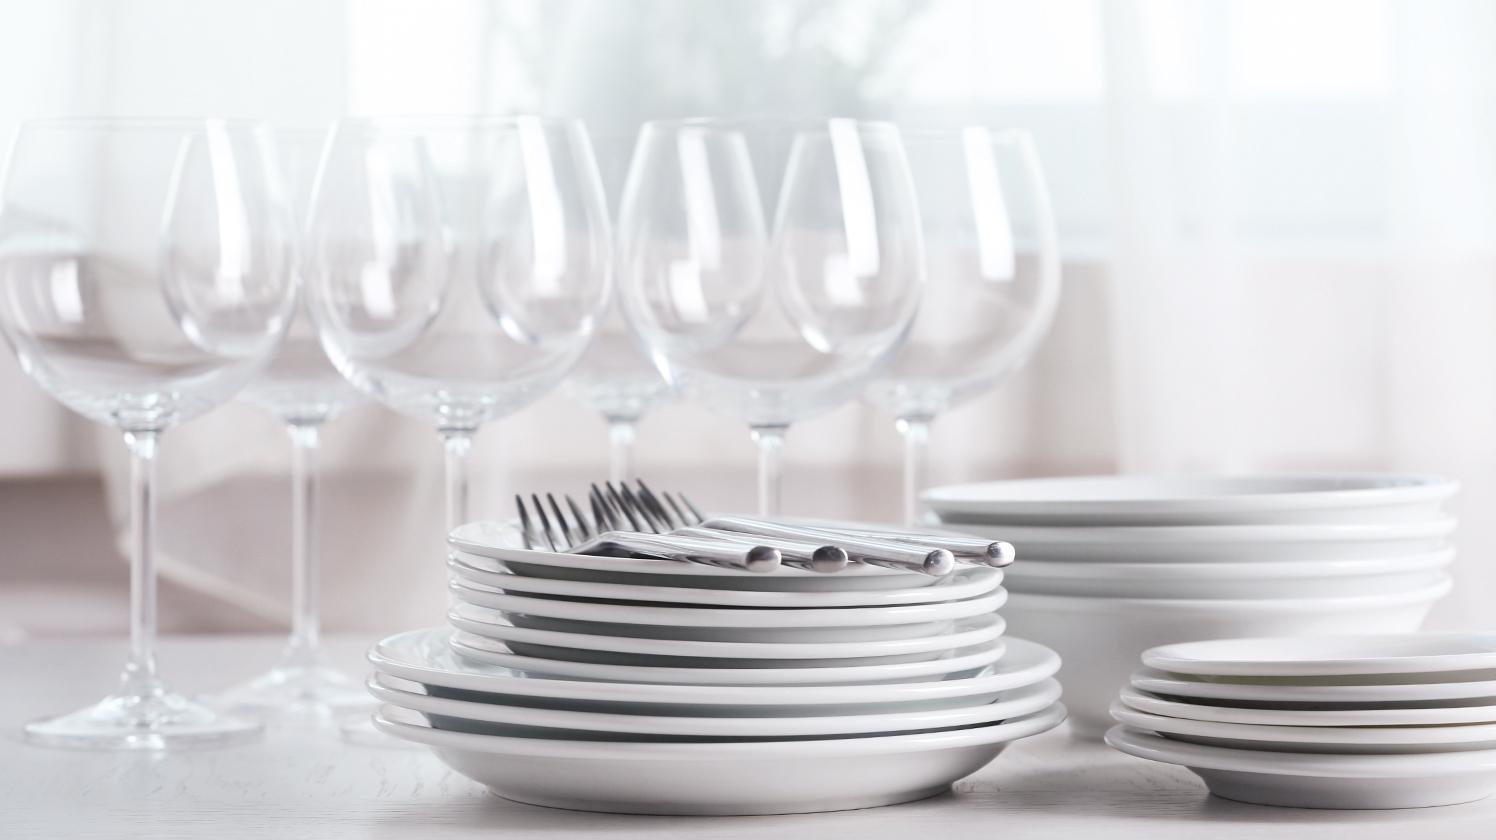 BRITA acqua bicchieri piatti catering